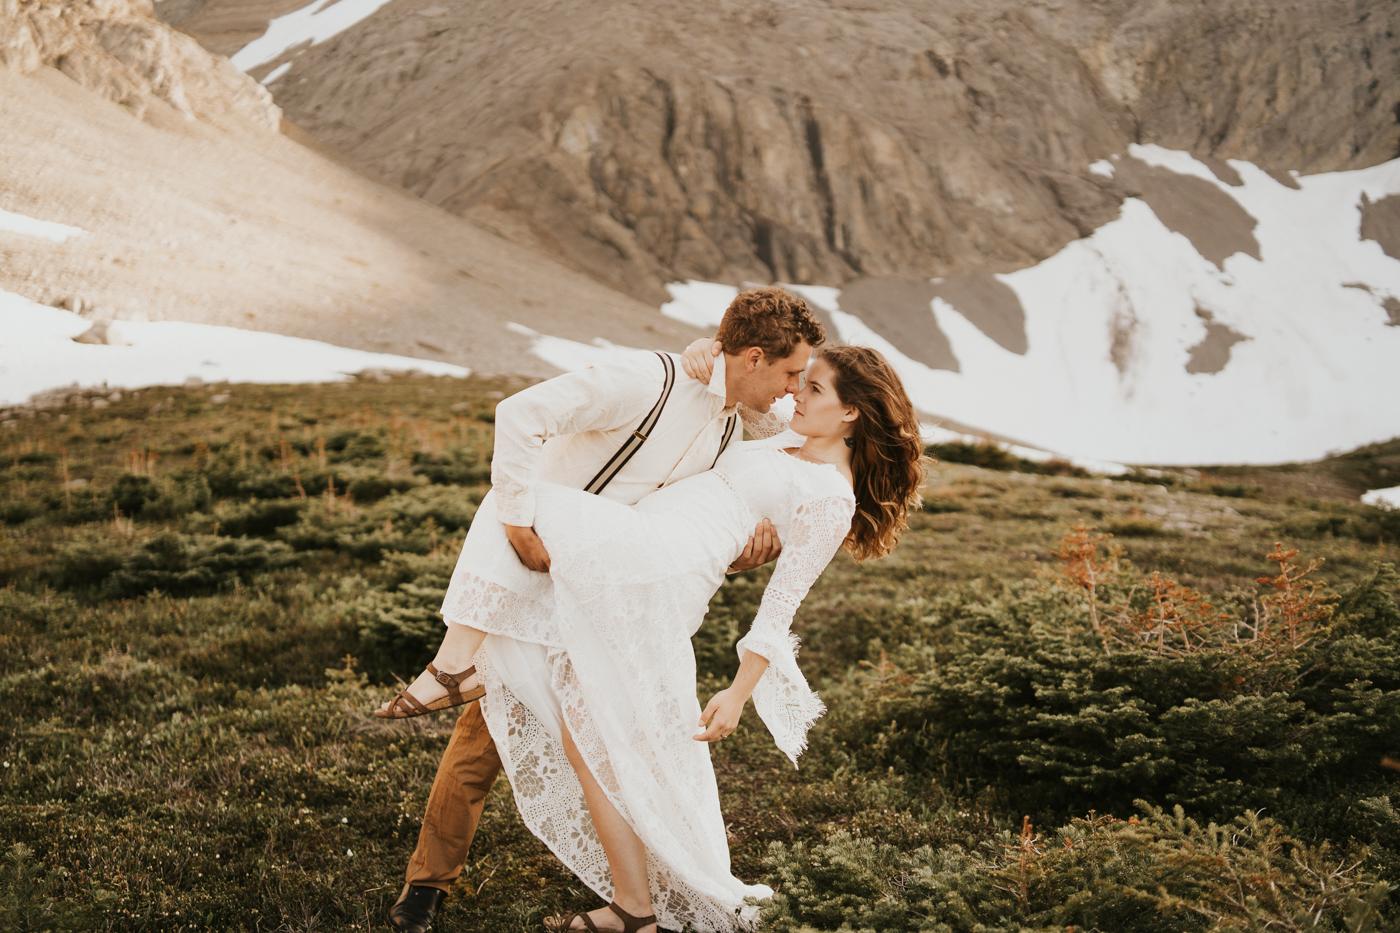 tyraephotography_photographer_wedding_elopement_engagement_photography-08049.jpg